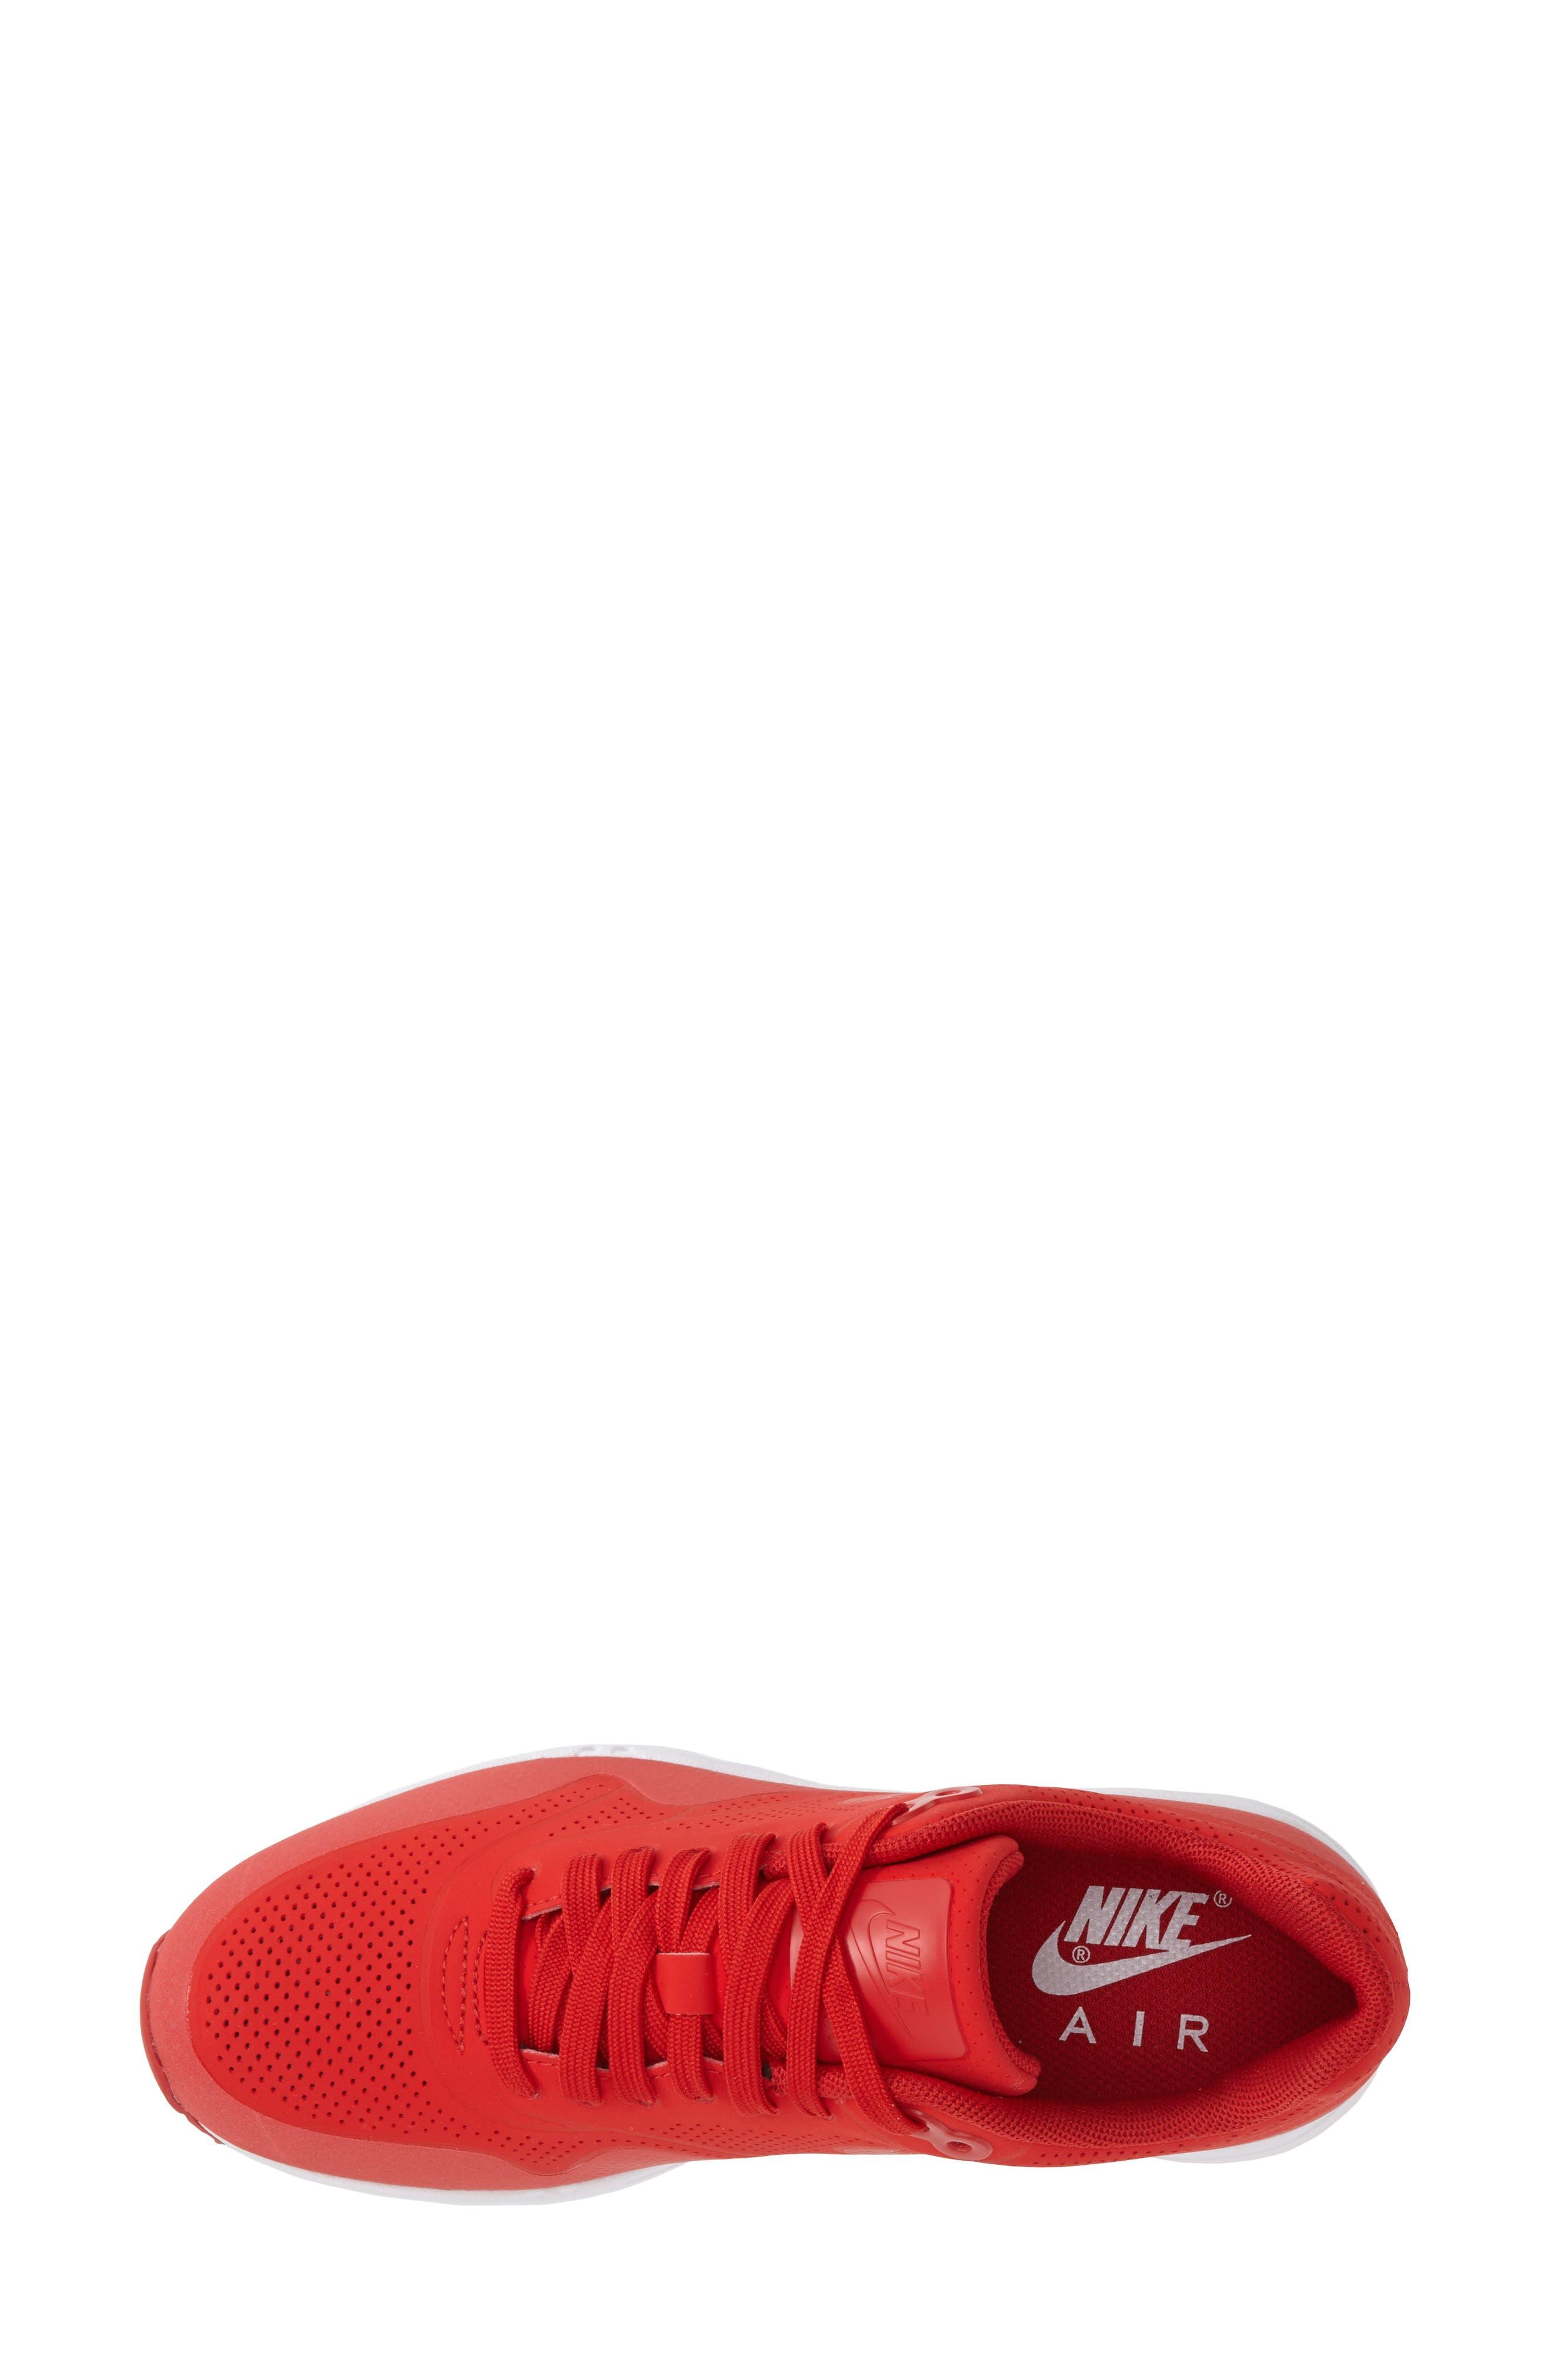 ,                             'Air Max 1 - Ultra Moire' Sneaker,                             Alternate thumbnail 100, color,                             600